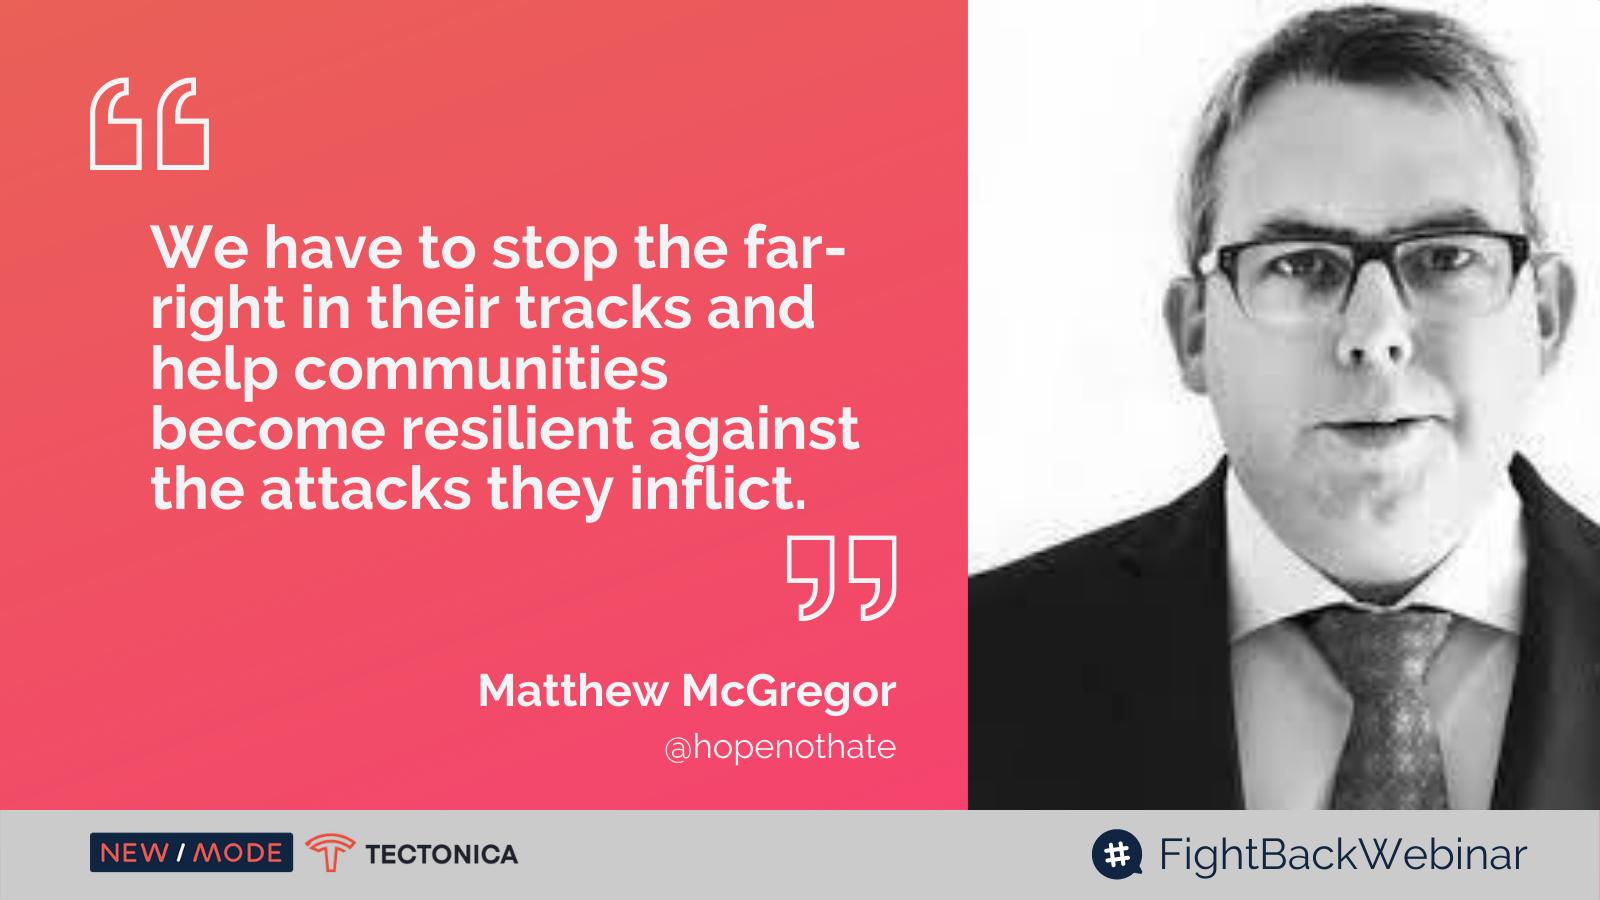 Fighting the Far-Right Live Tweet Matthew